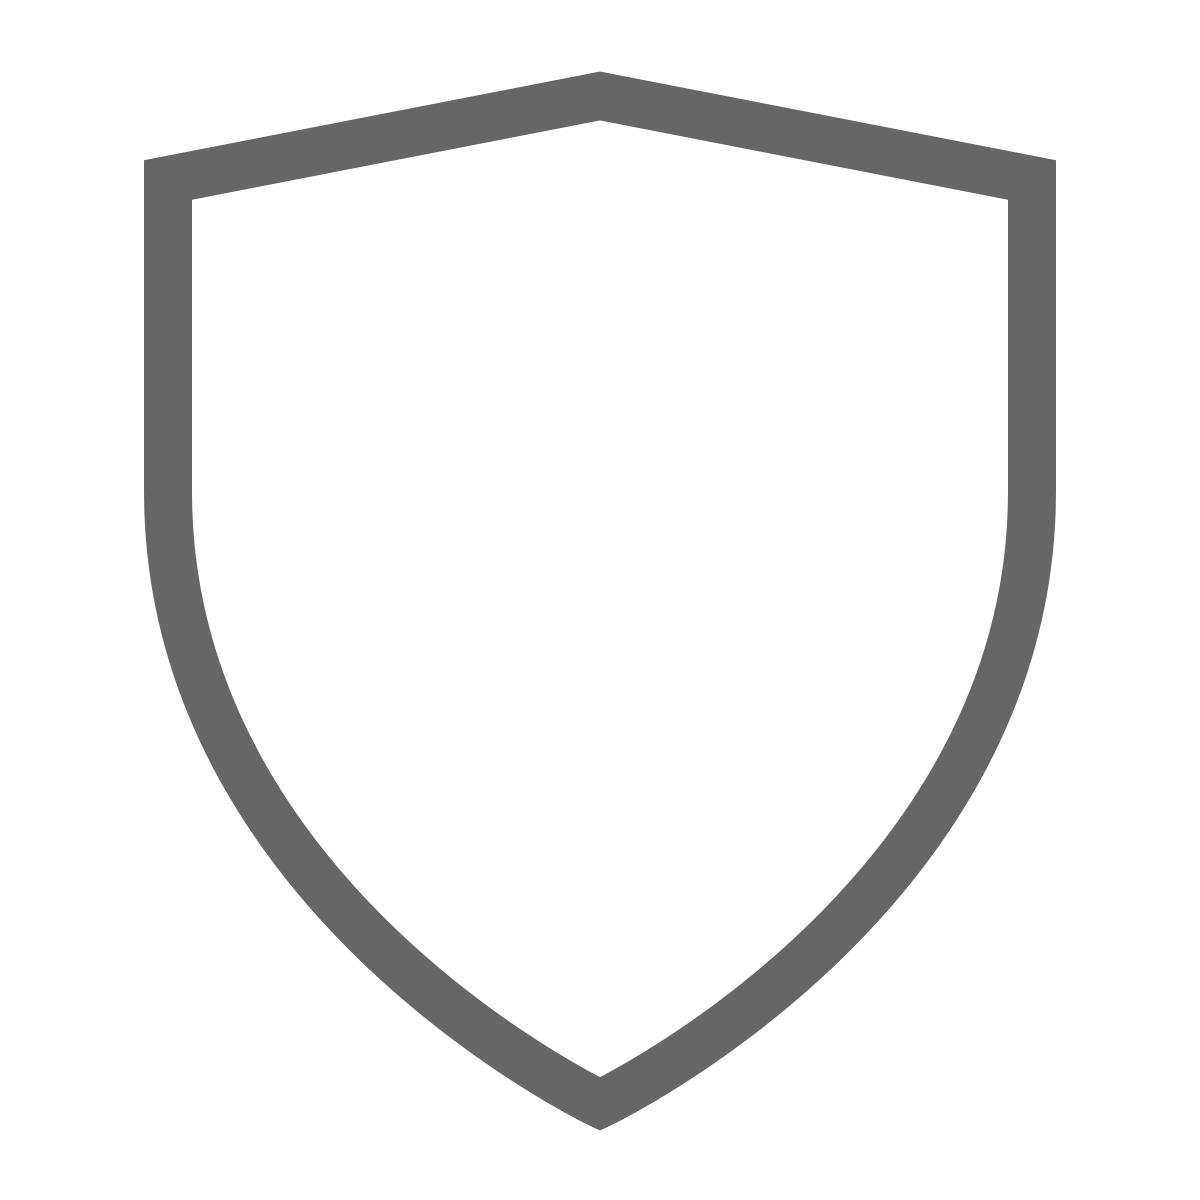 noun_Shield_305036_666666opQrCMlelpv1E